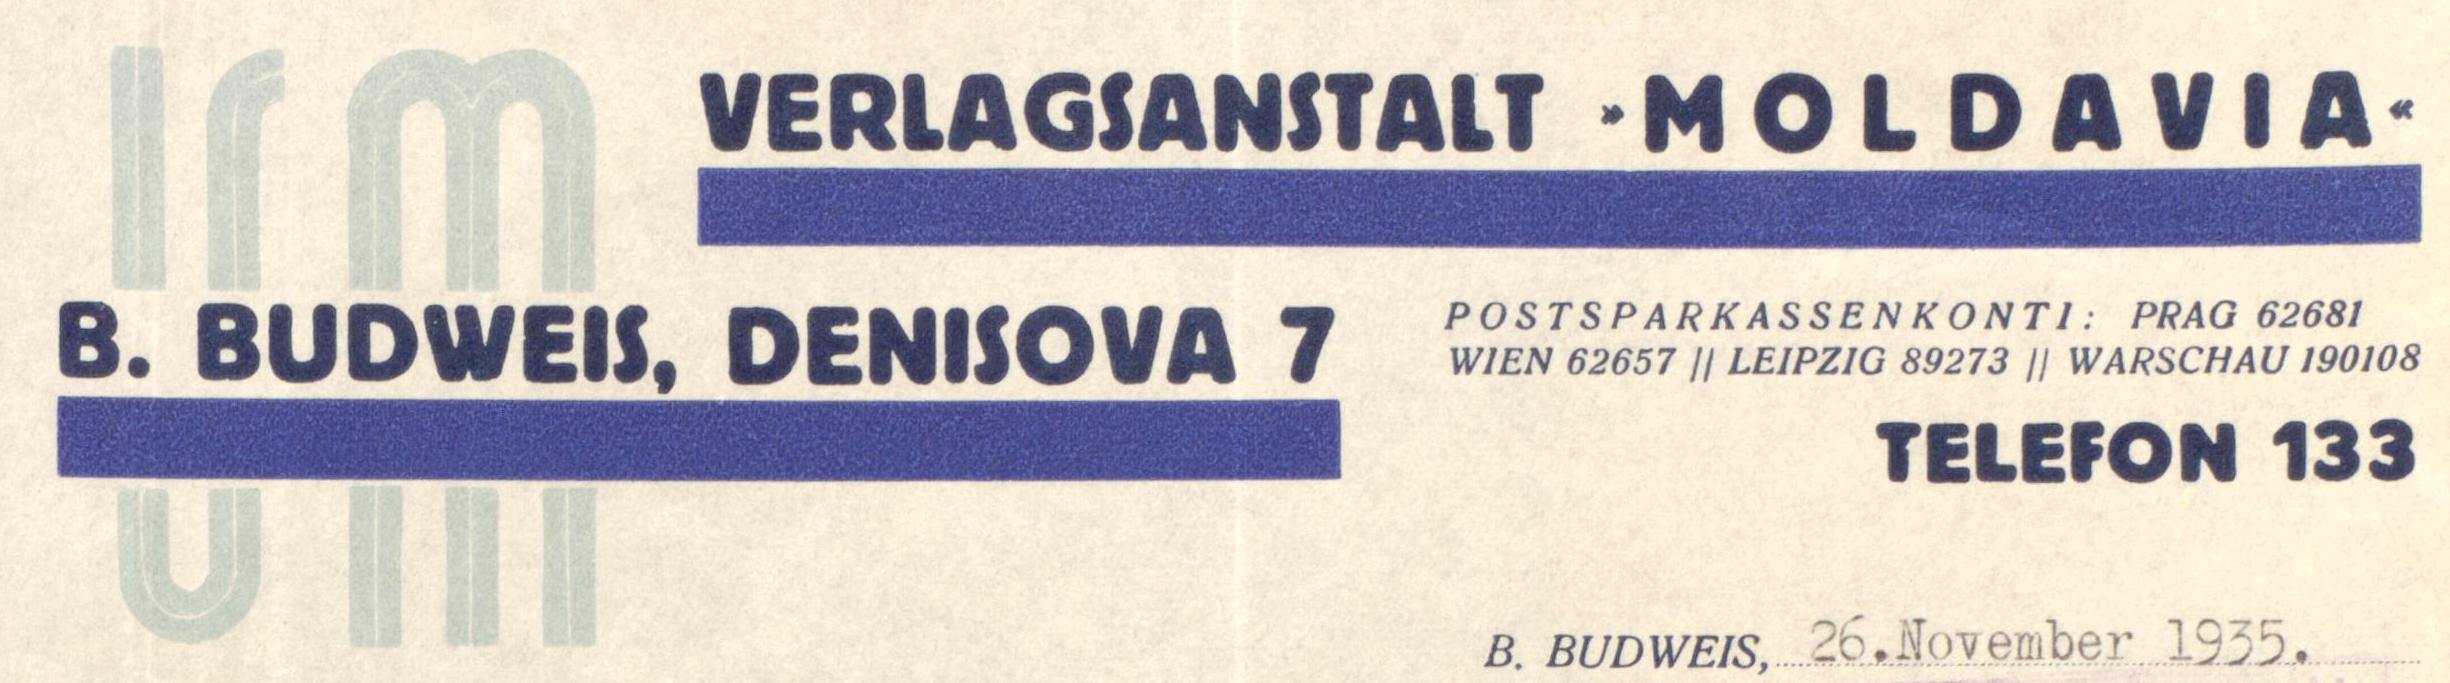 Moldavia Briefkopf